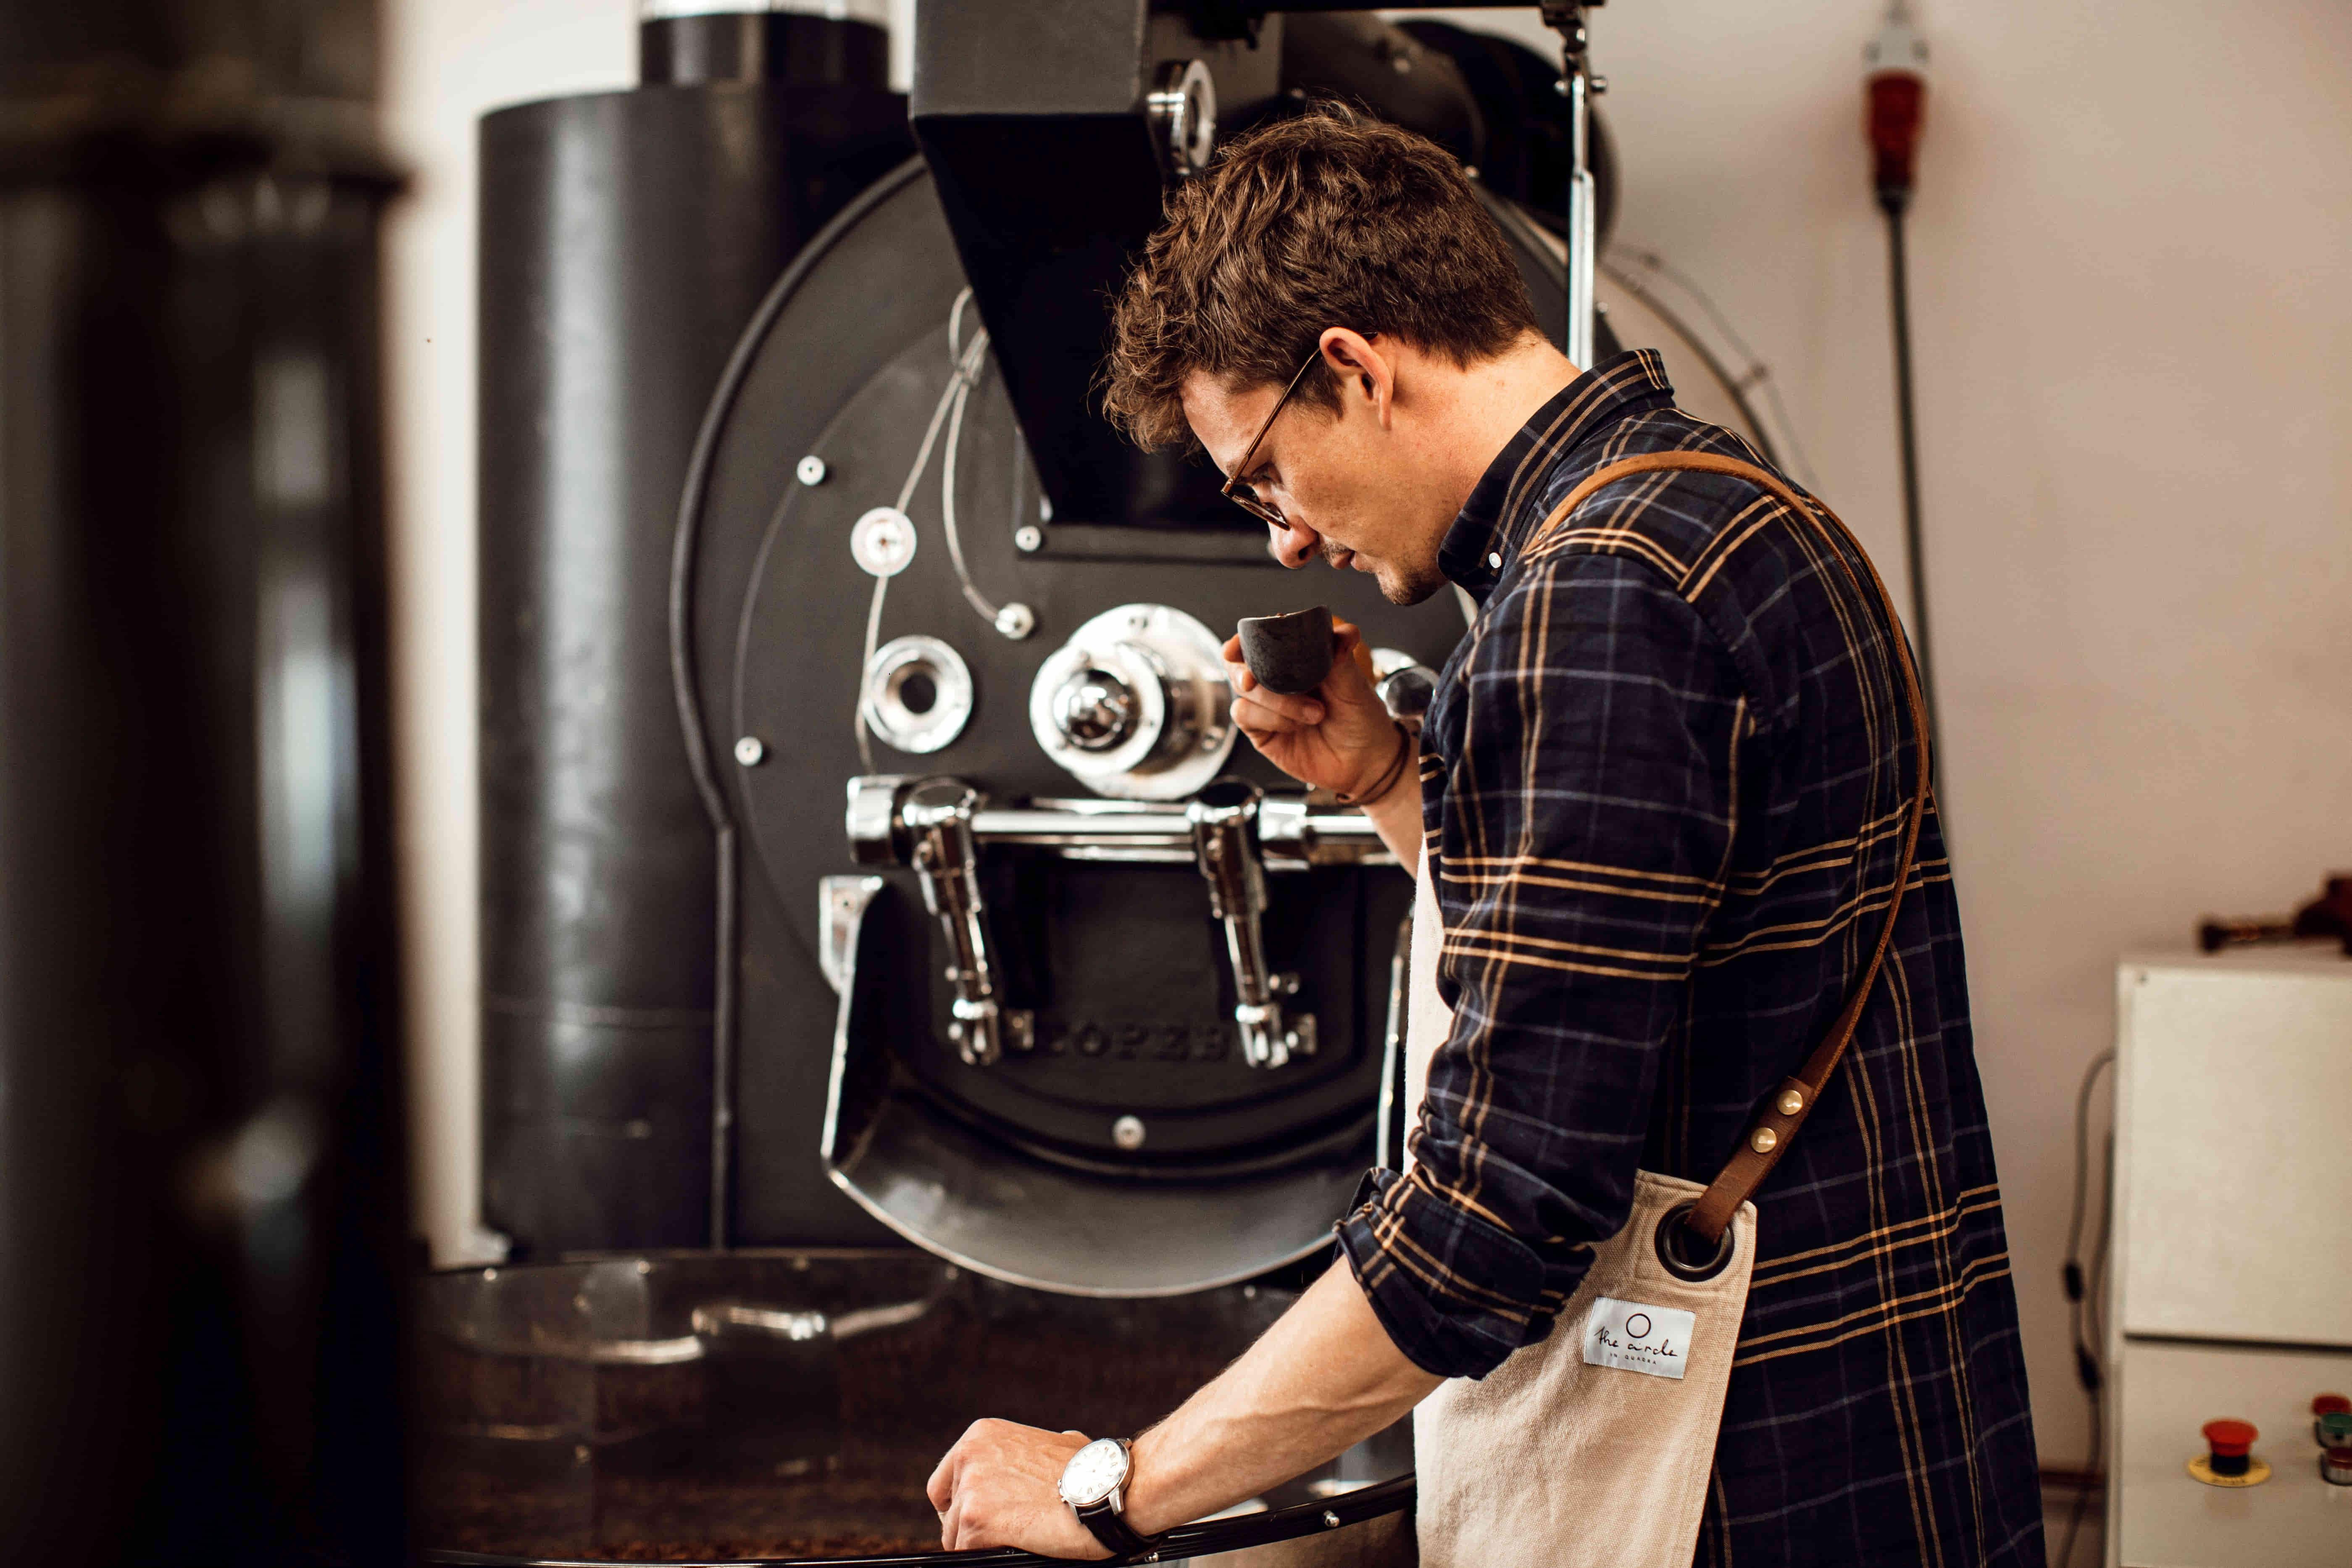 Die Geschichte von https://cdn.sensaterra.com/artisans/concrete-coffee-roasters-539a0760-23bf-e6ed-f025-08d8cf6ab220.jpg